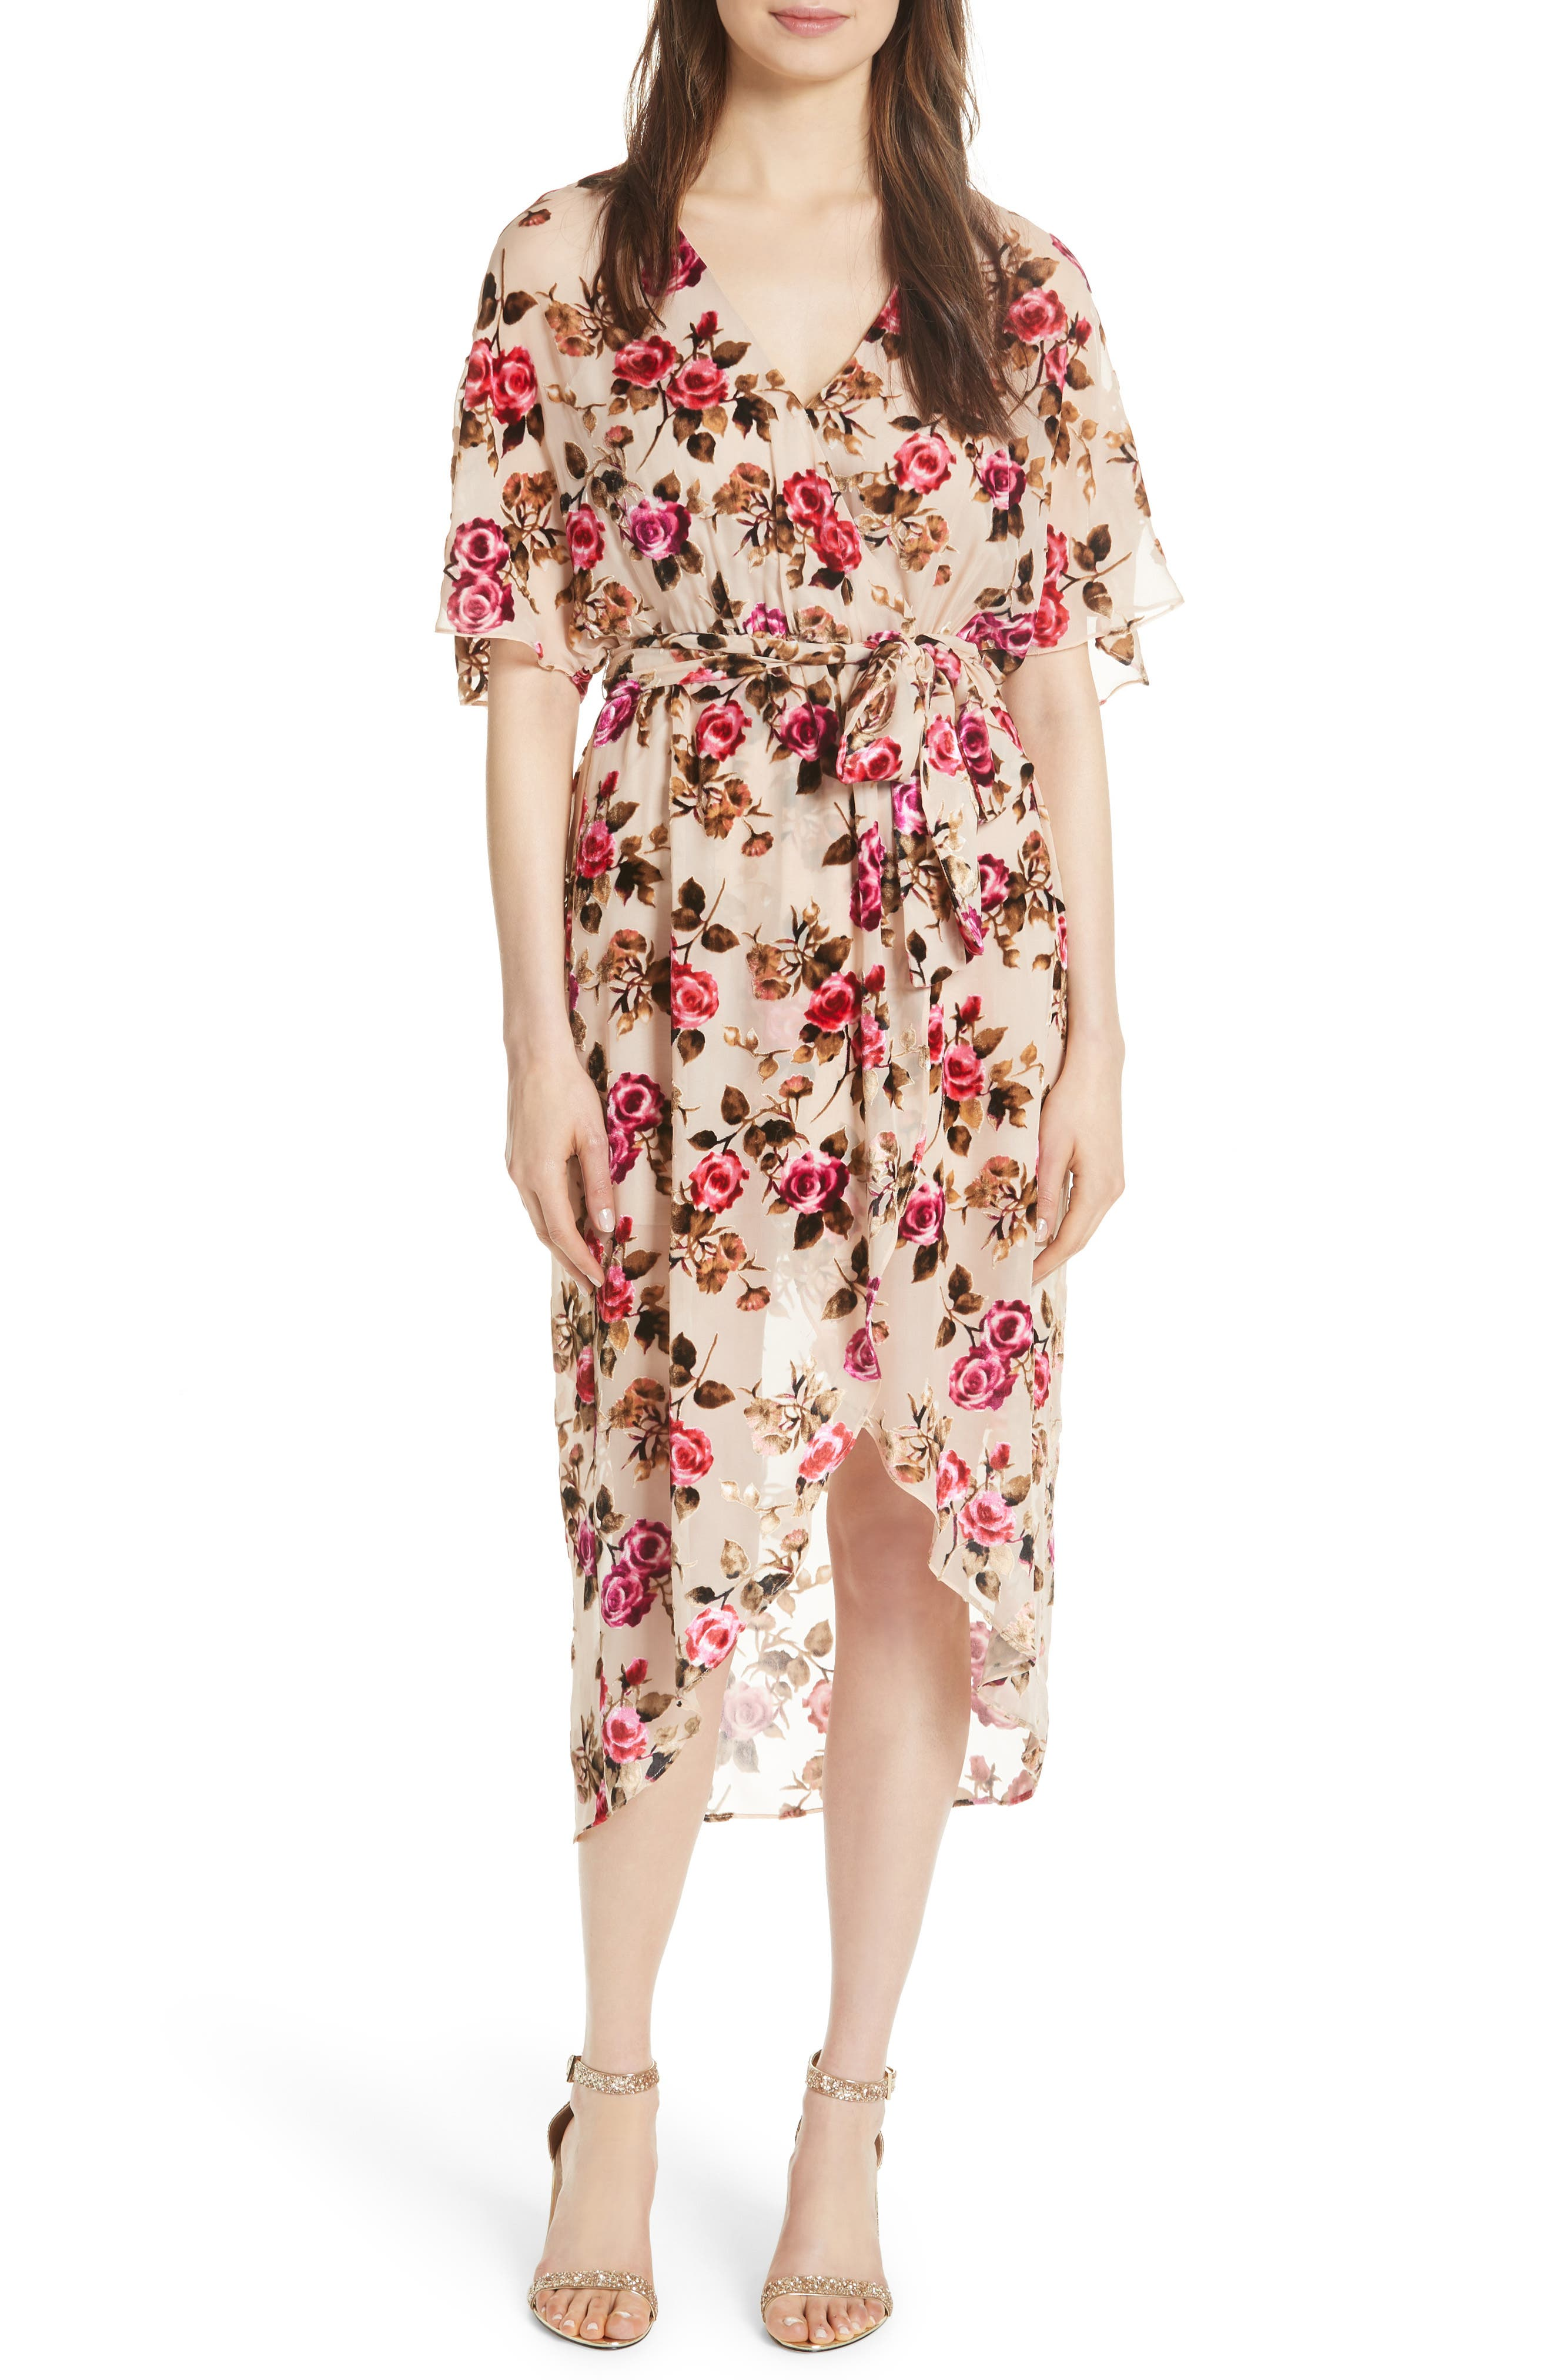 ALICE + OLIVIA,                             Clarine Floral Faux Wrap Dress,                             Main thumbnail 1, color,                             251